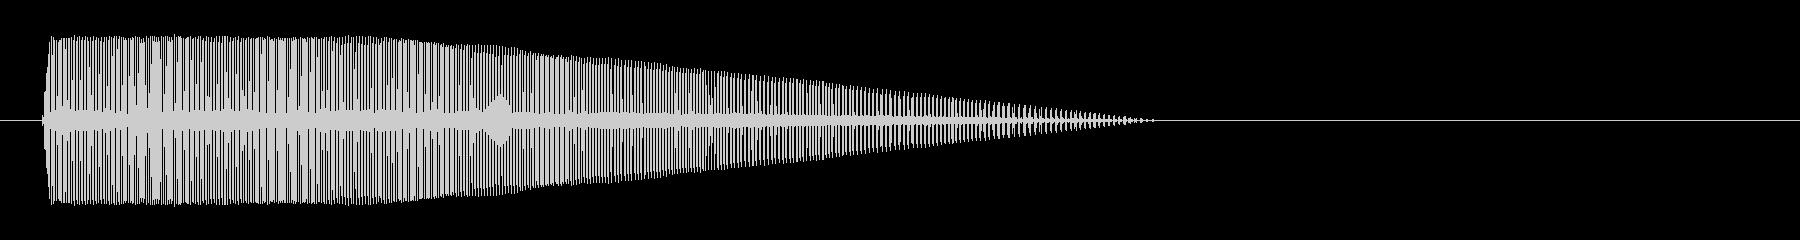 8bitのボヨヨヨヨ↓の未再生の波形